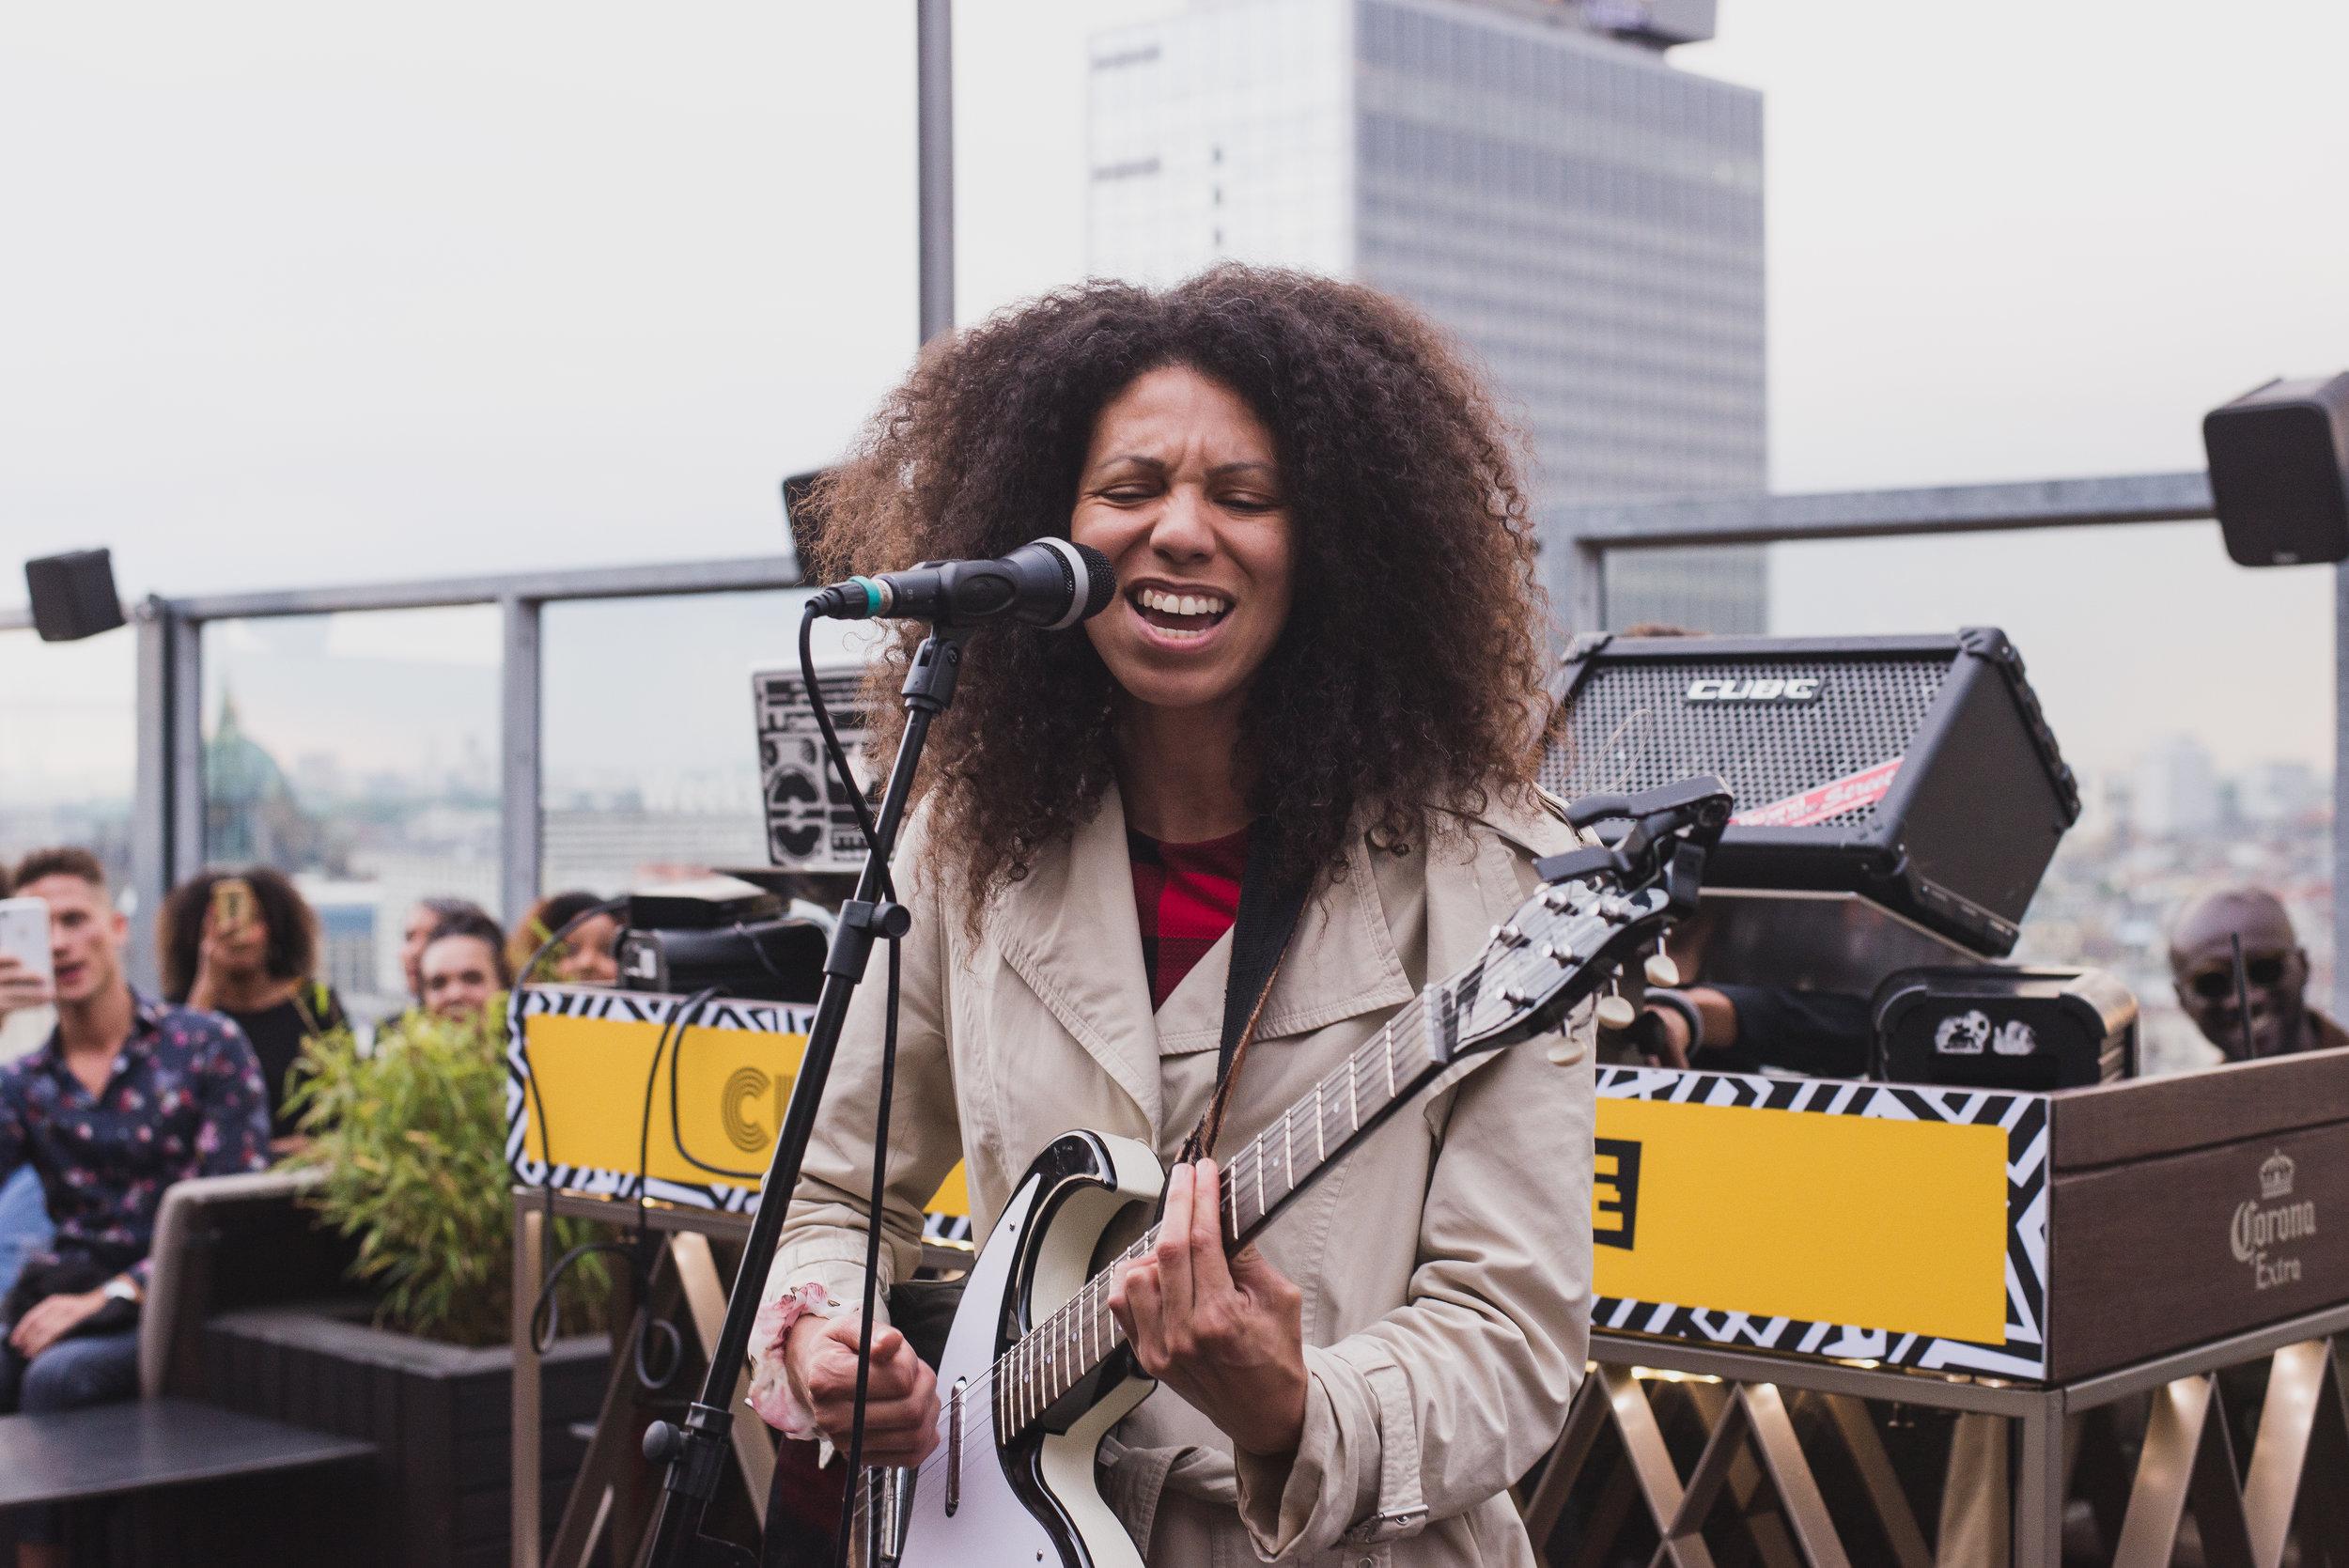 Musikerin Abstrak Jaz eröffnet als erster Live-Act den Abend, (C) Daria Modin